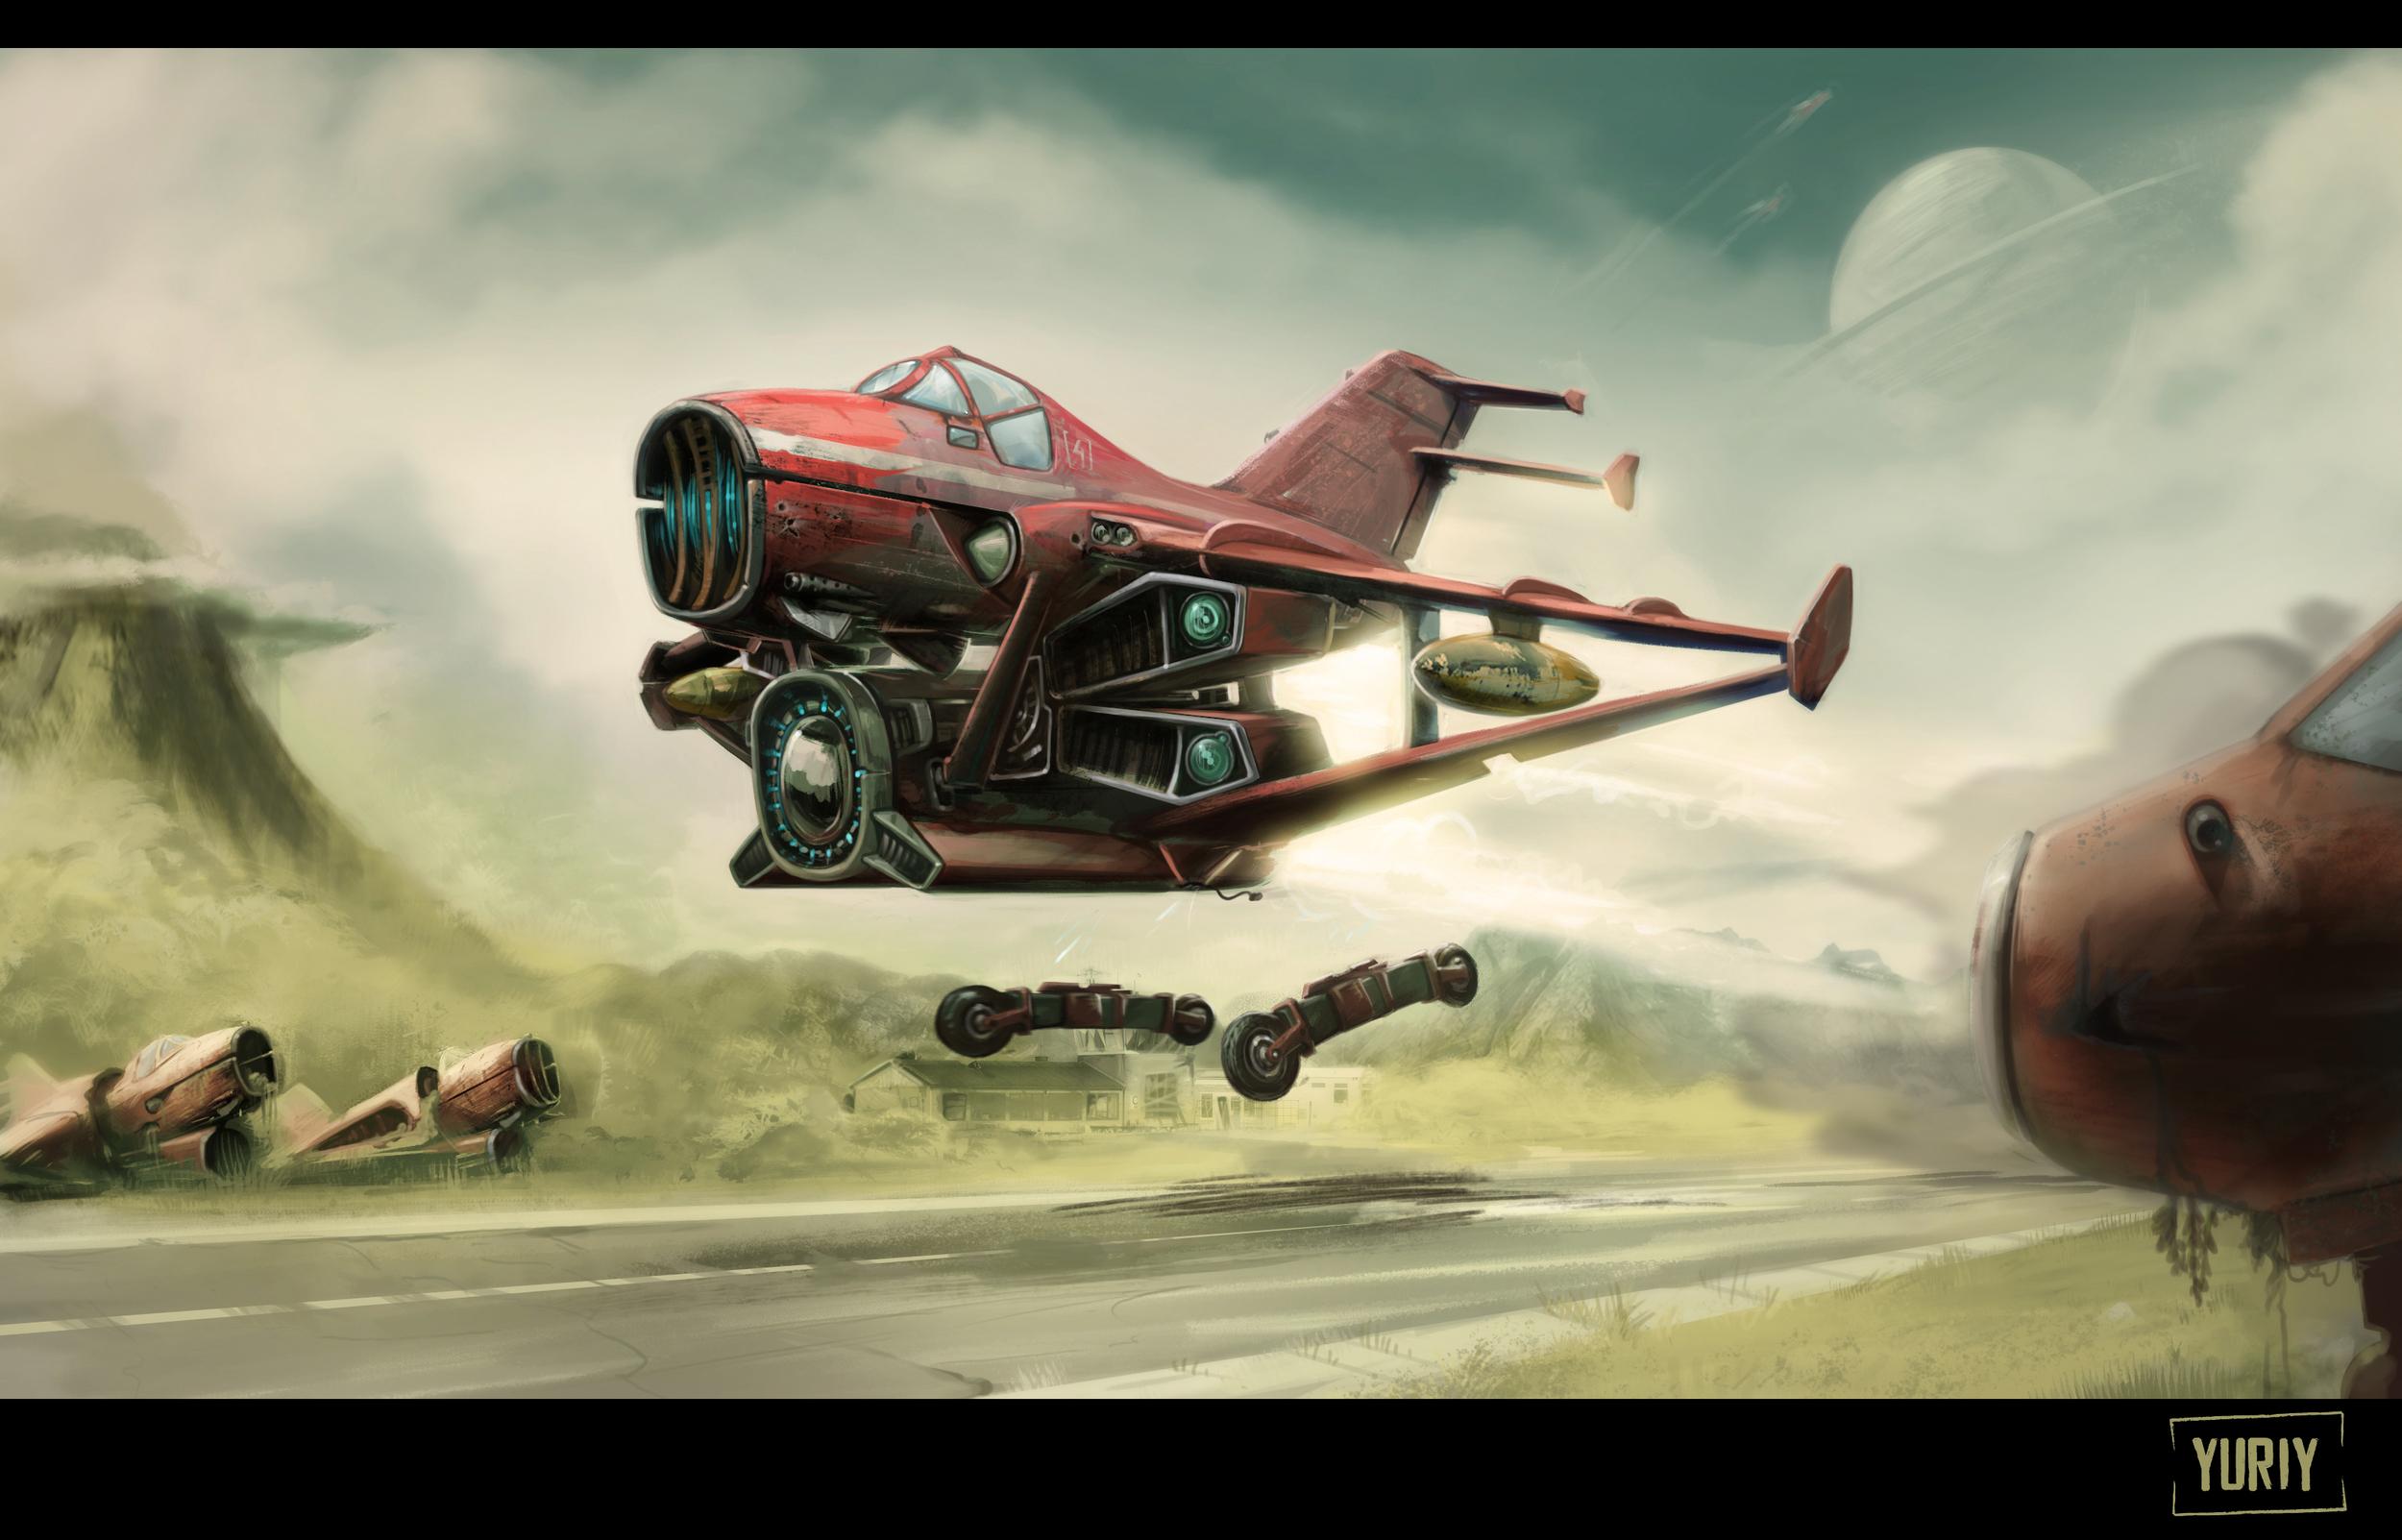 Rocket-Powered Aircraft